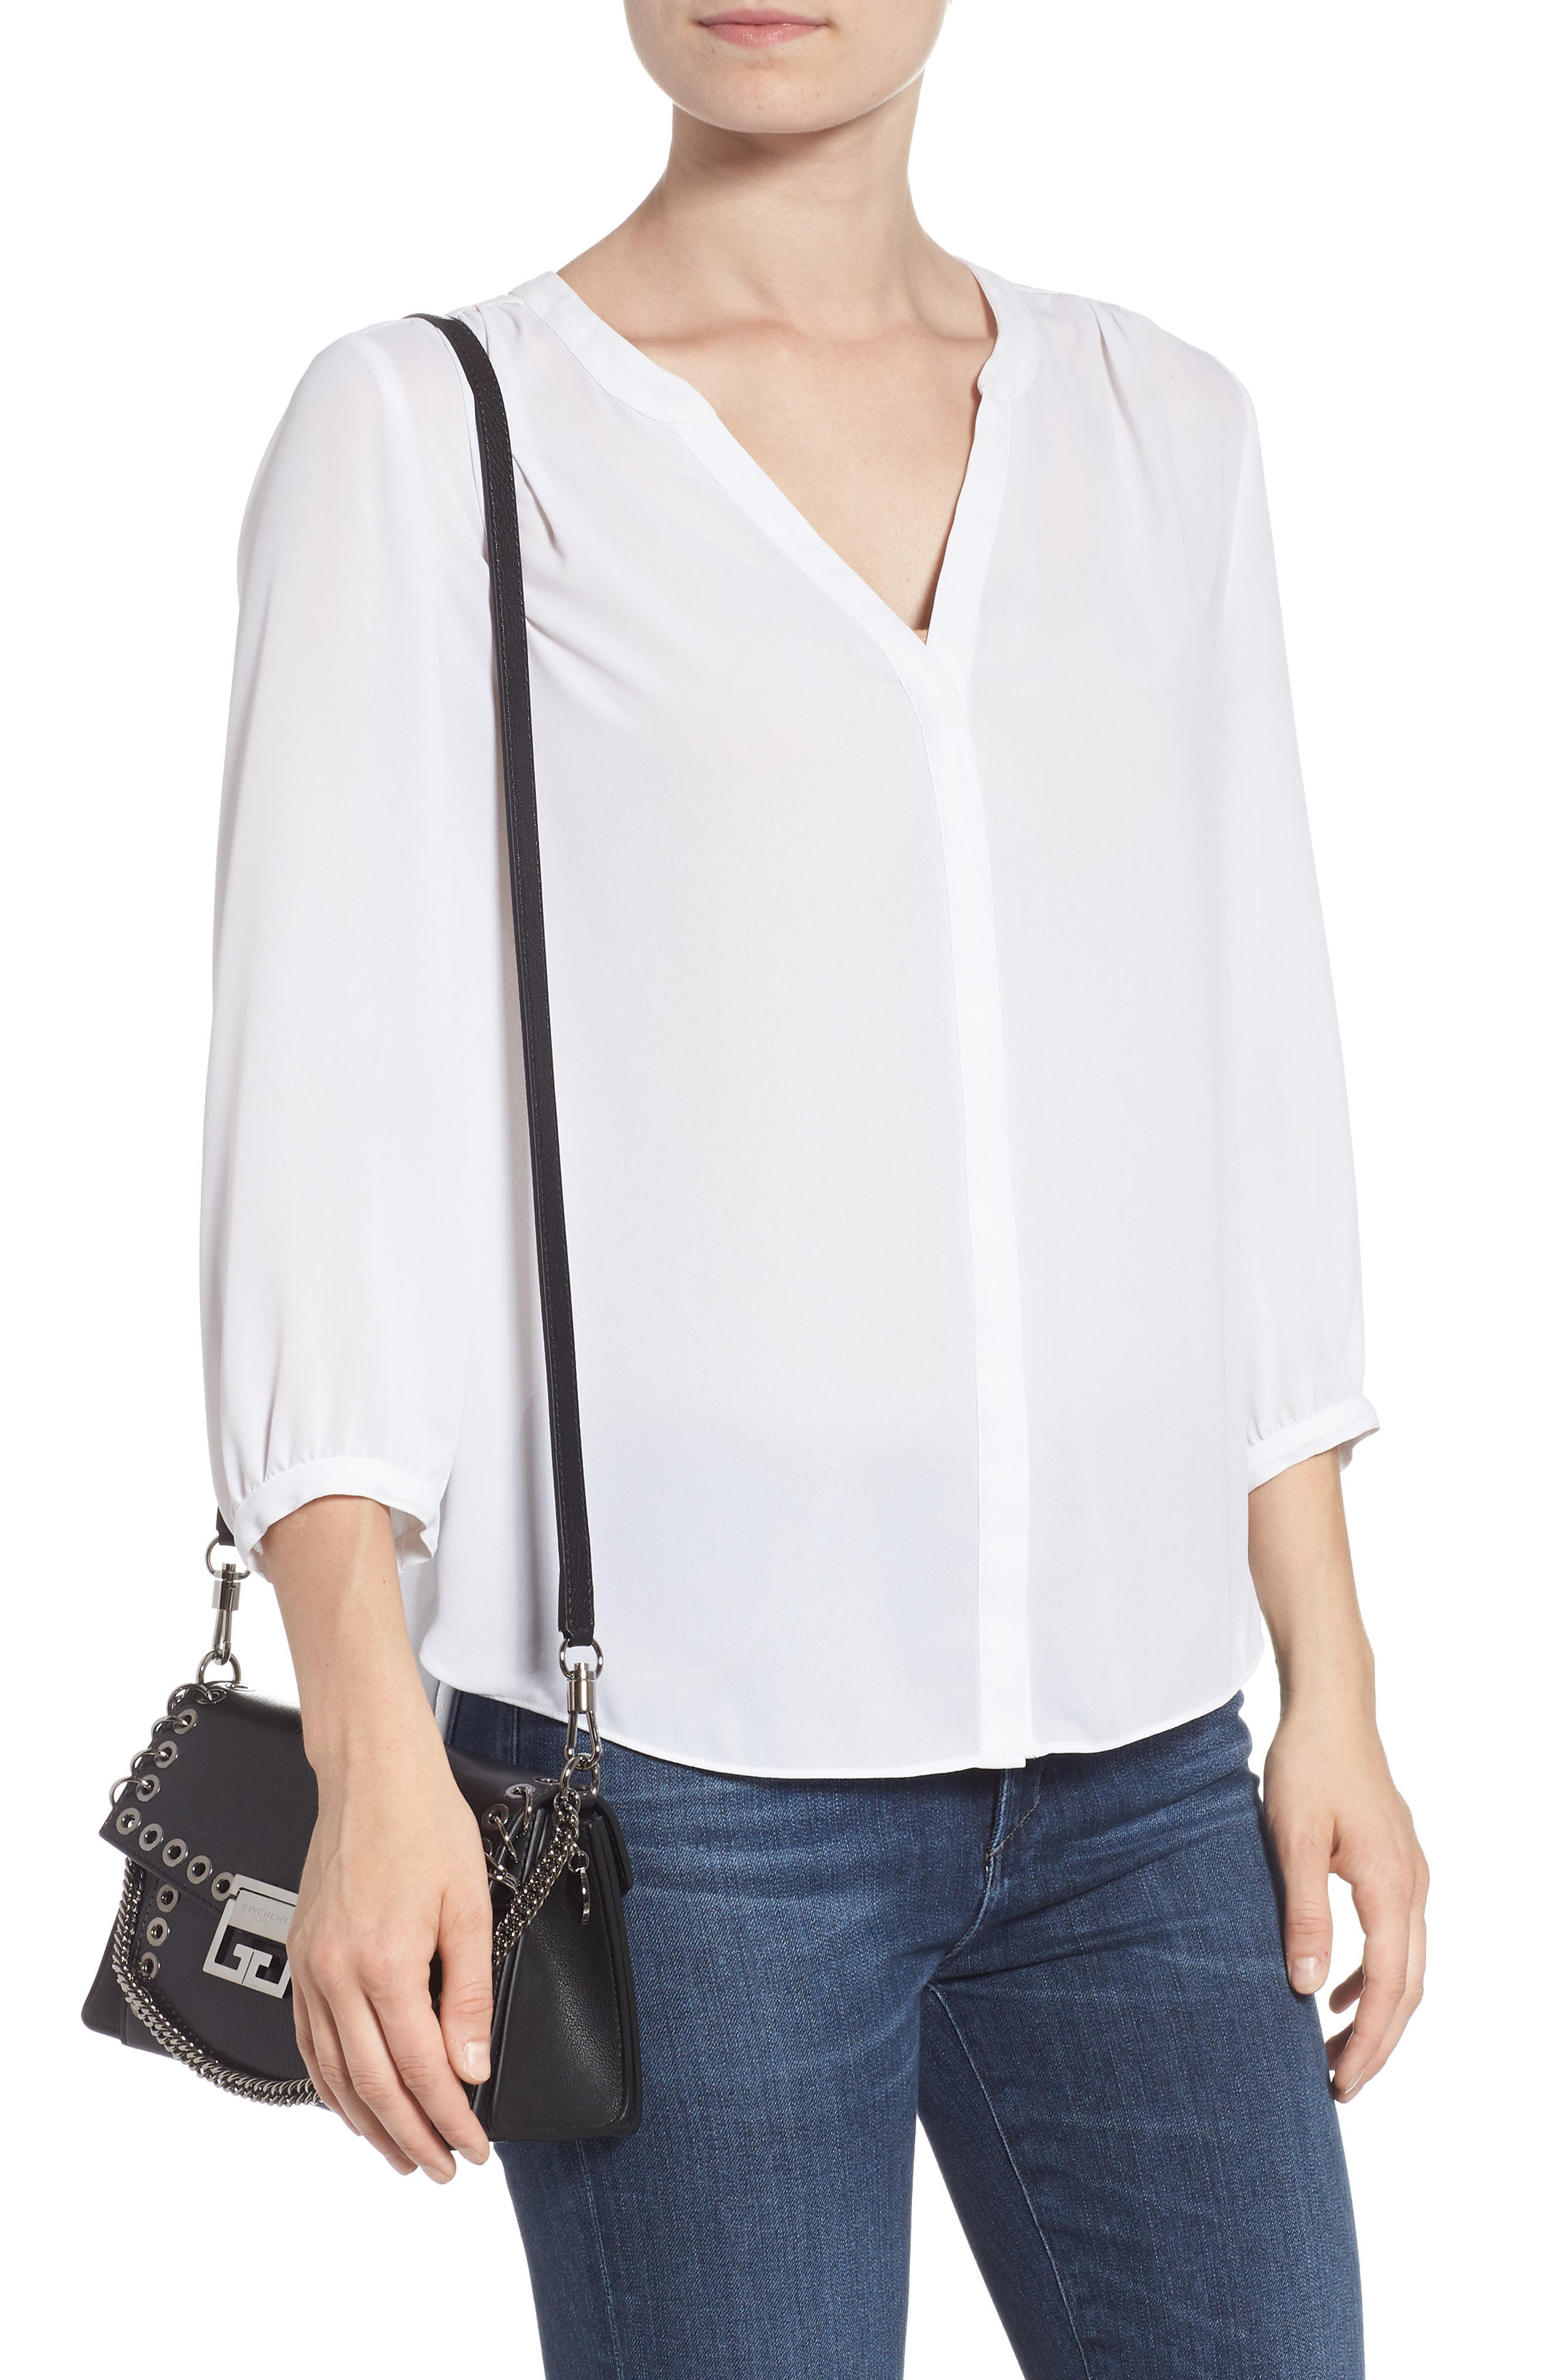 GIVENCHY,                             GV3 Eyelet and Rings Leather Shoulder Bag,                             Alternate thumbnail 2, color,                             BLACK